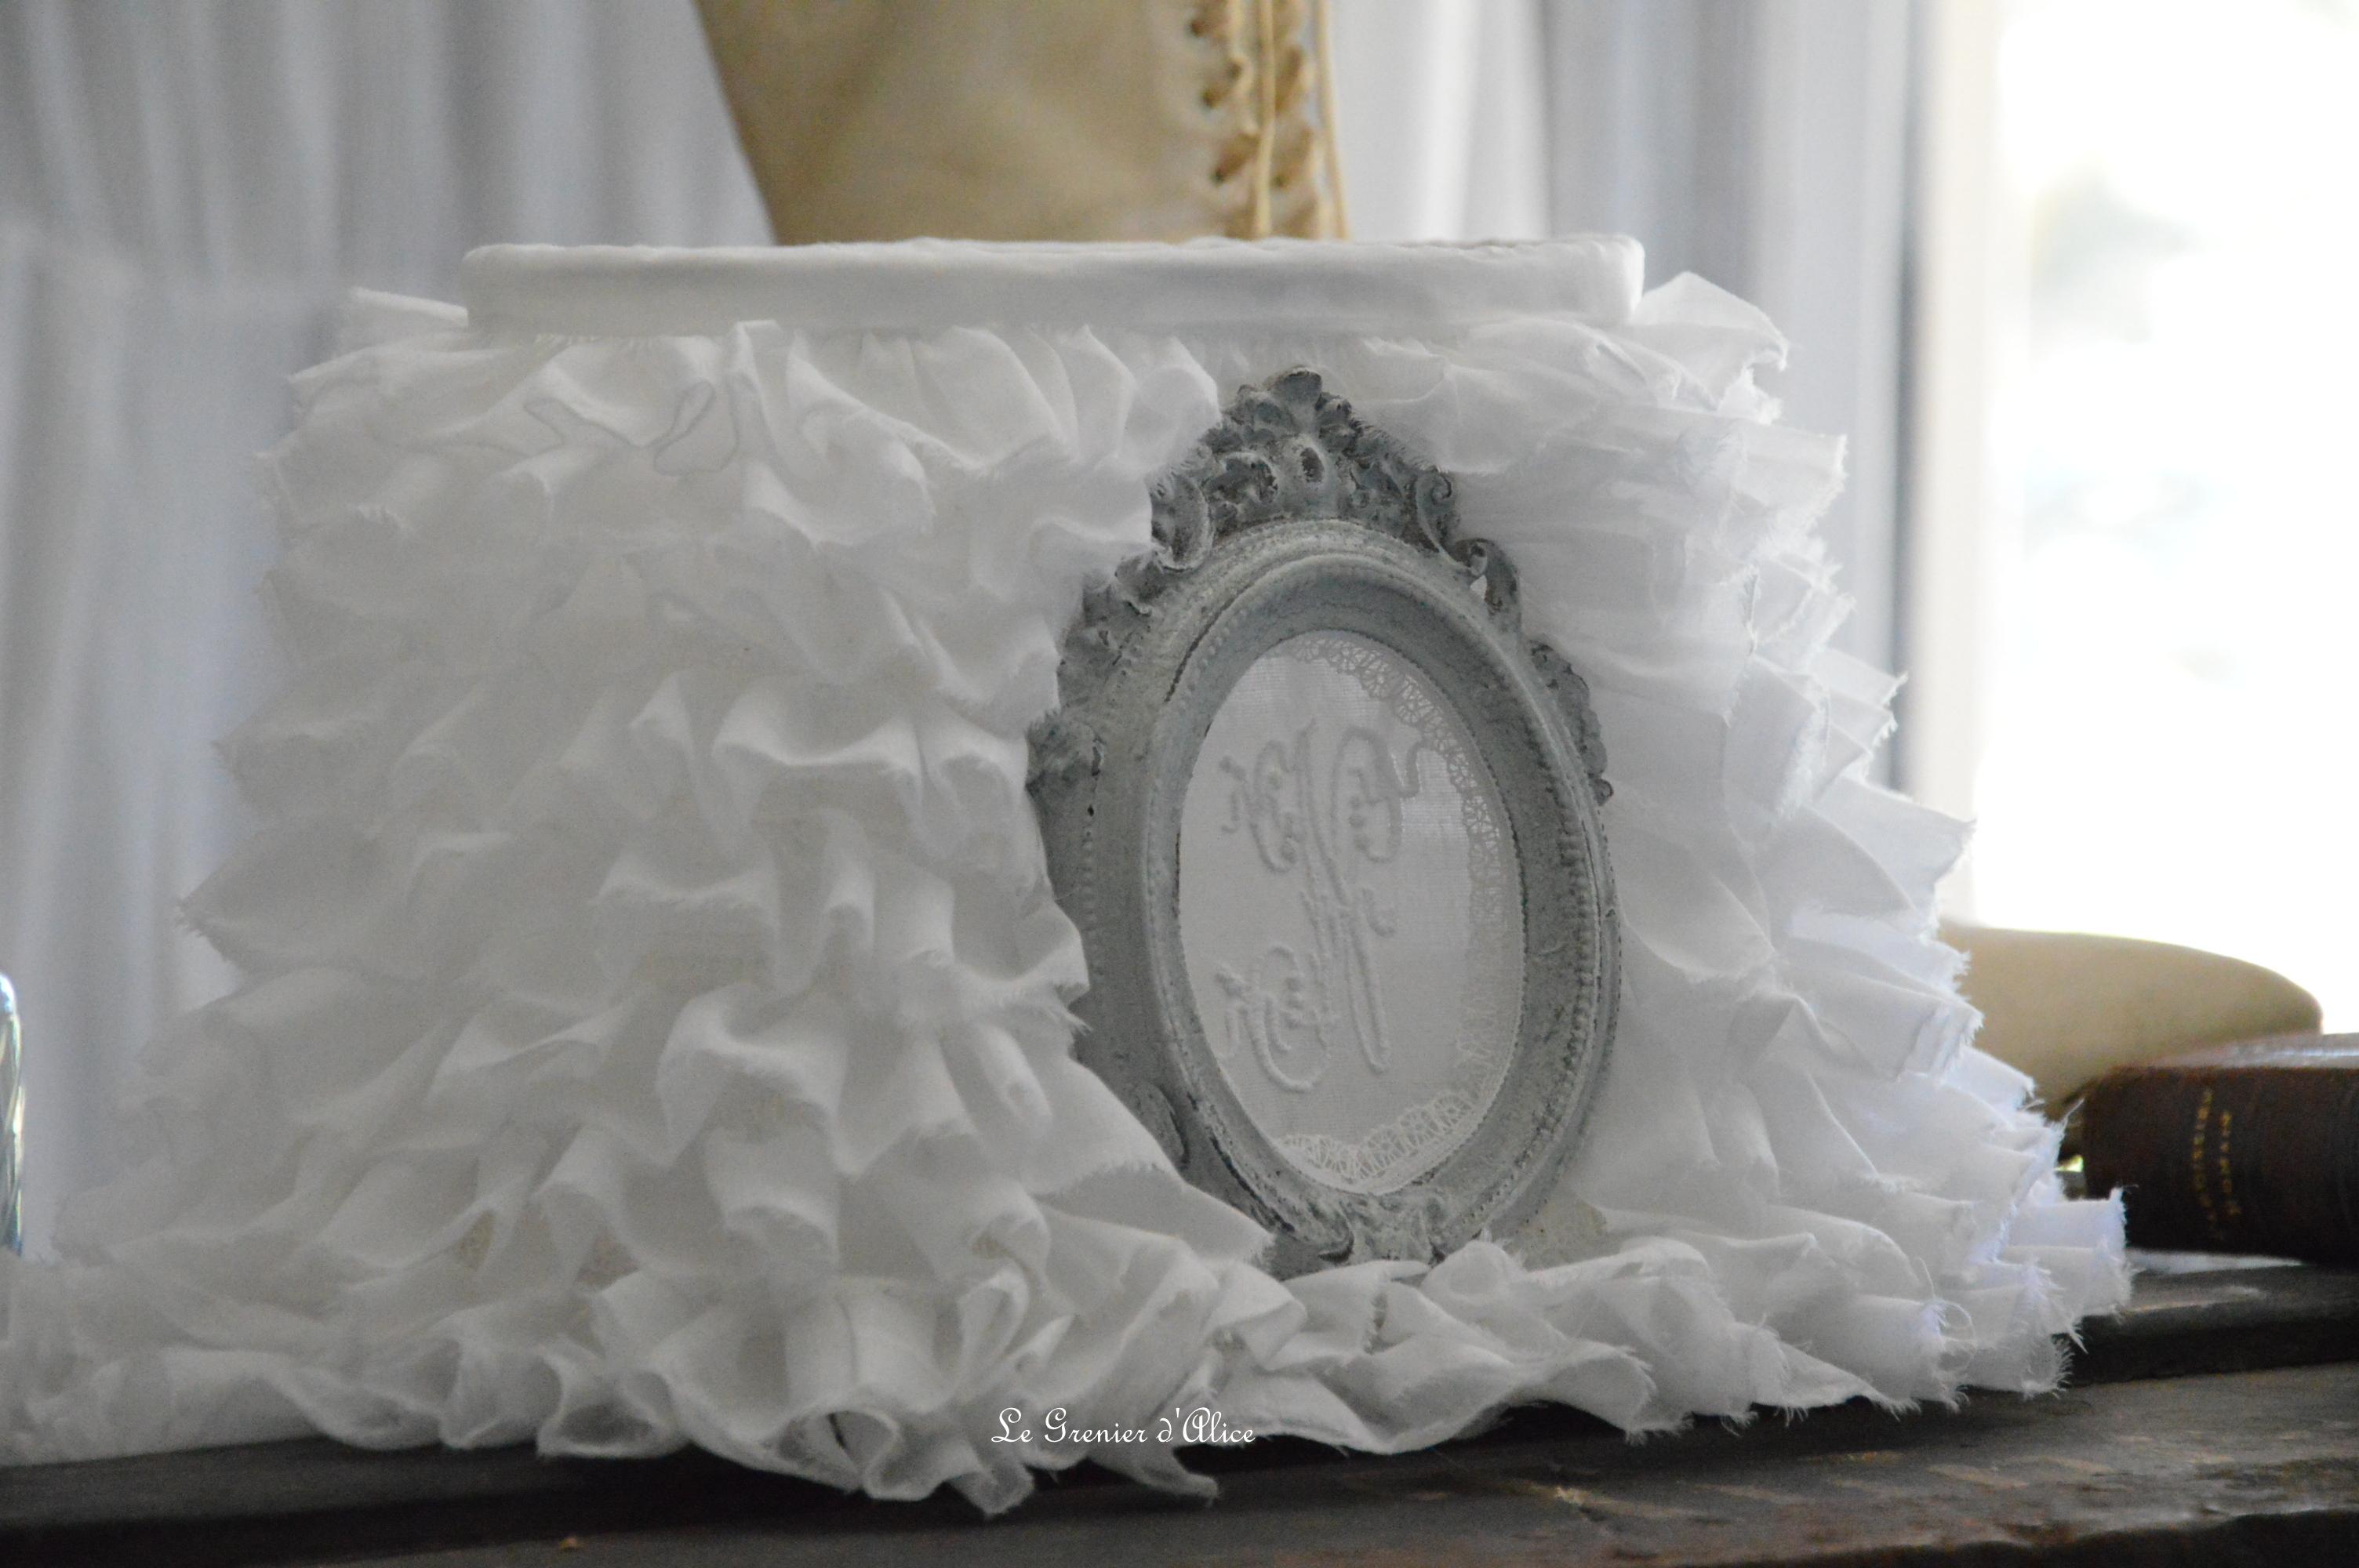 Abat jour oval froufrou organdi blanc shabby chic et romantique monogramme ornement patiné gris gustavien Shabby ruffle lampshade 1